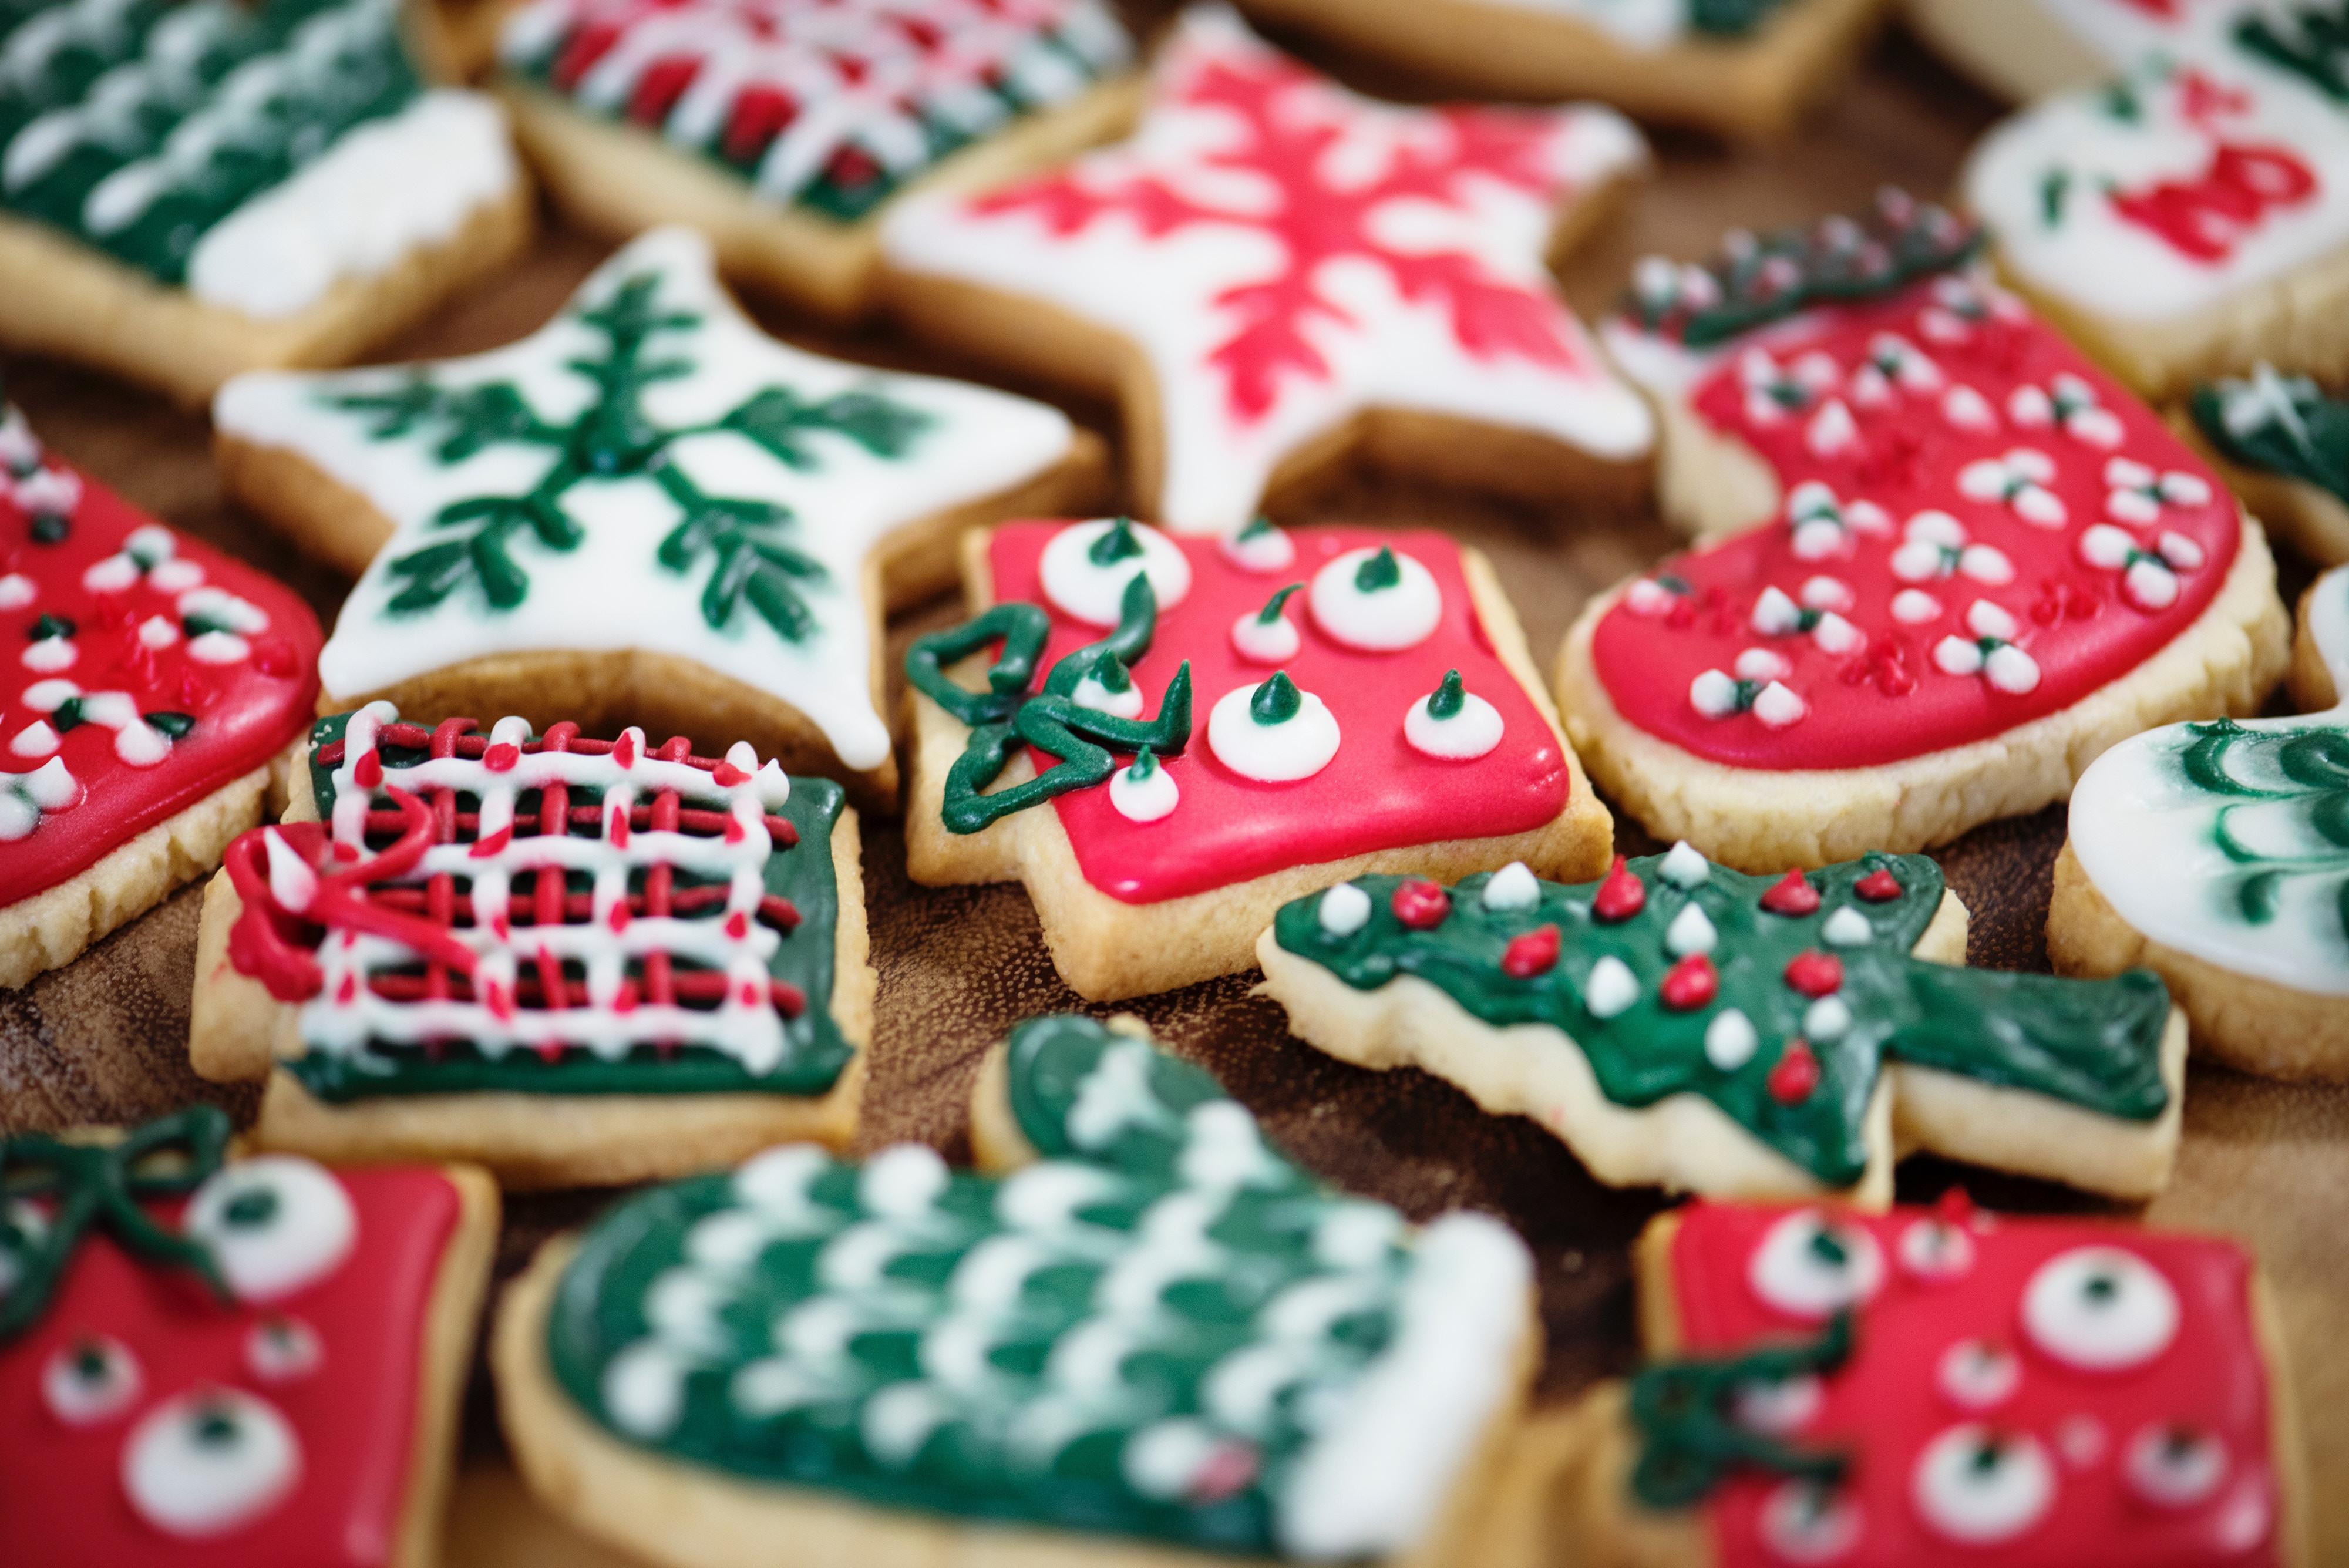 Wine and Christmas Cookie Tasting